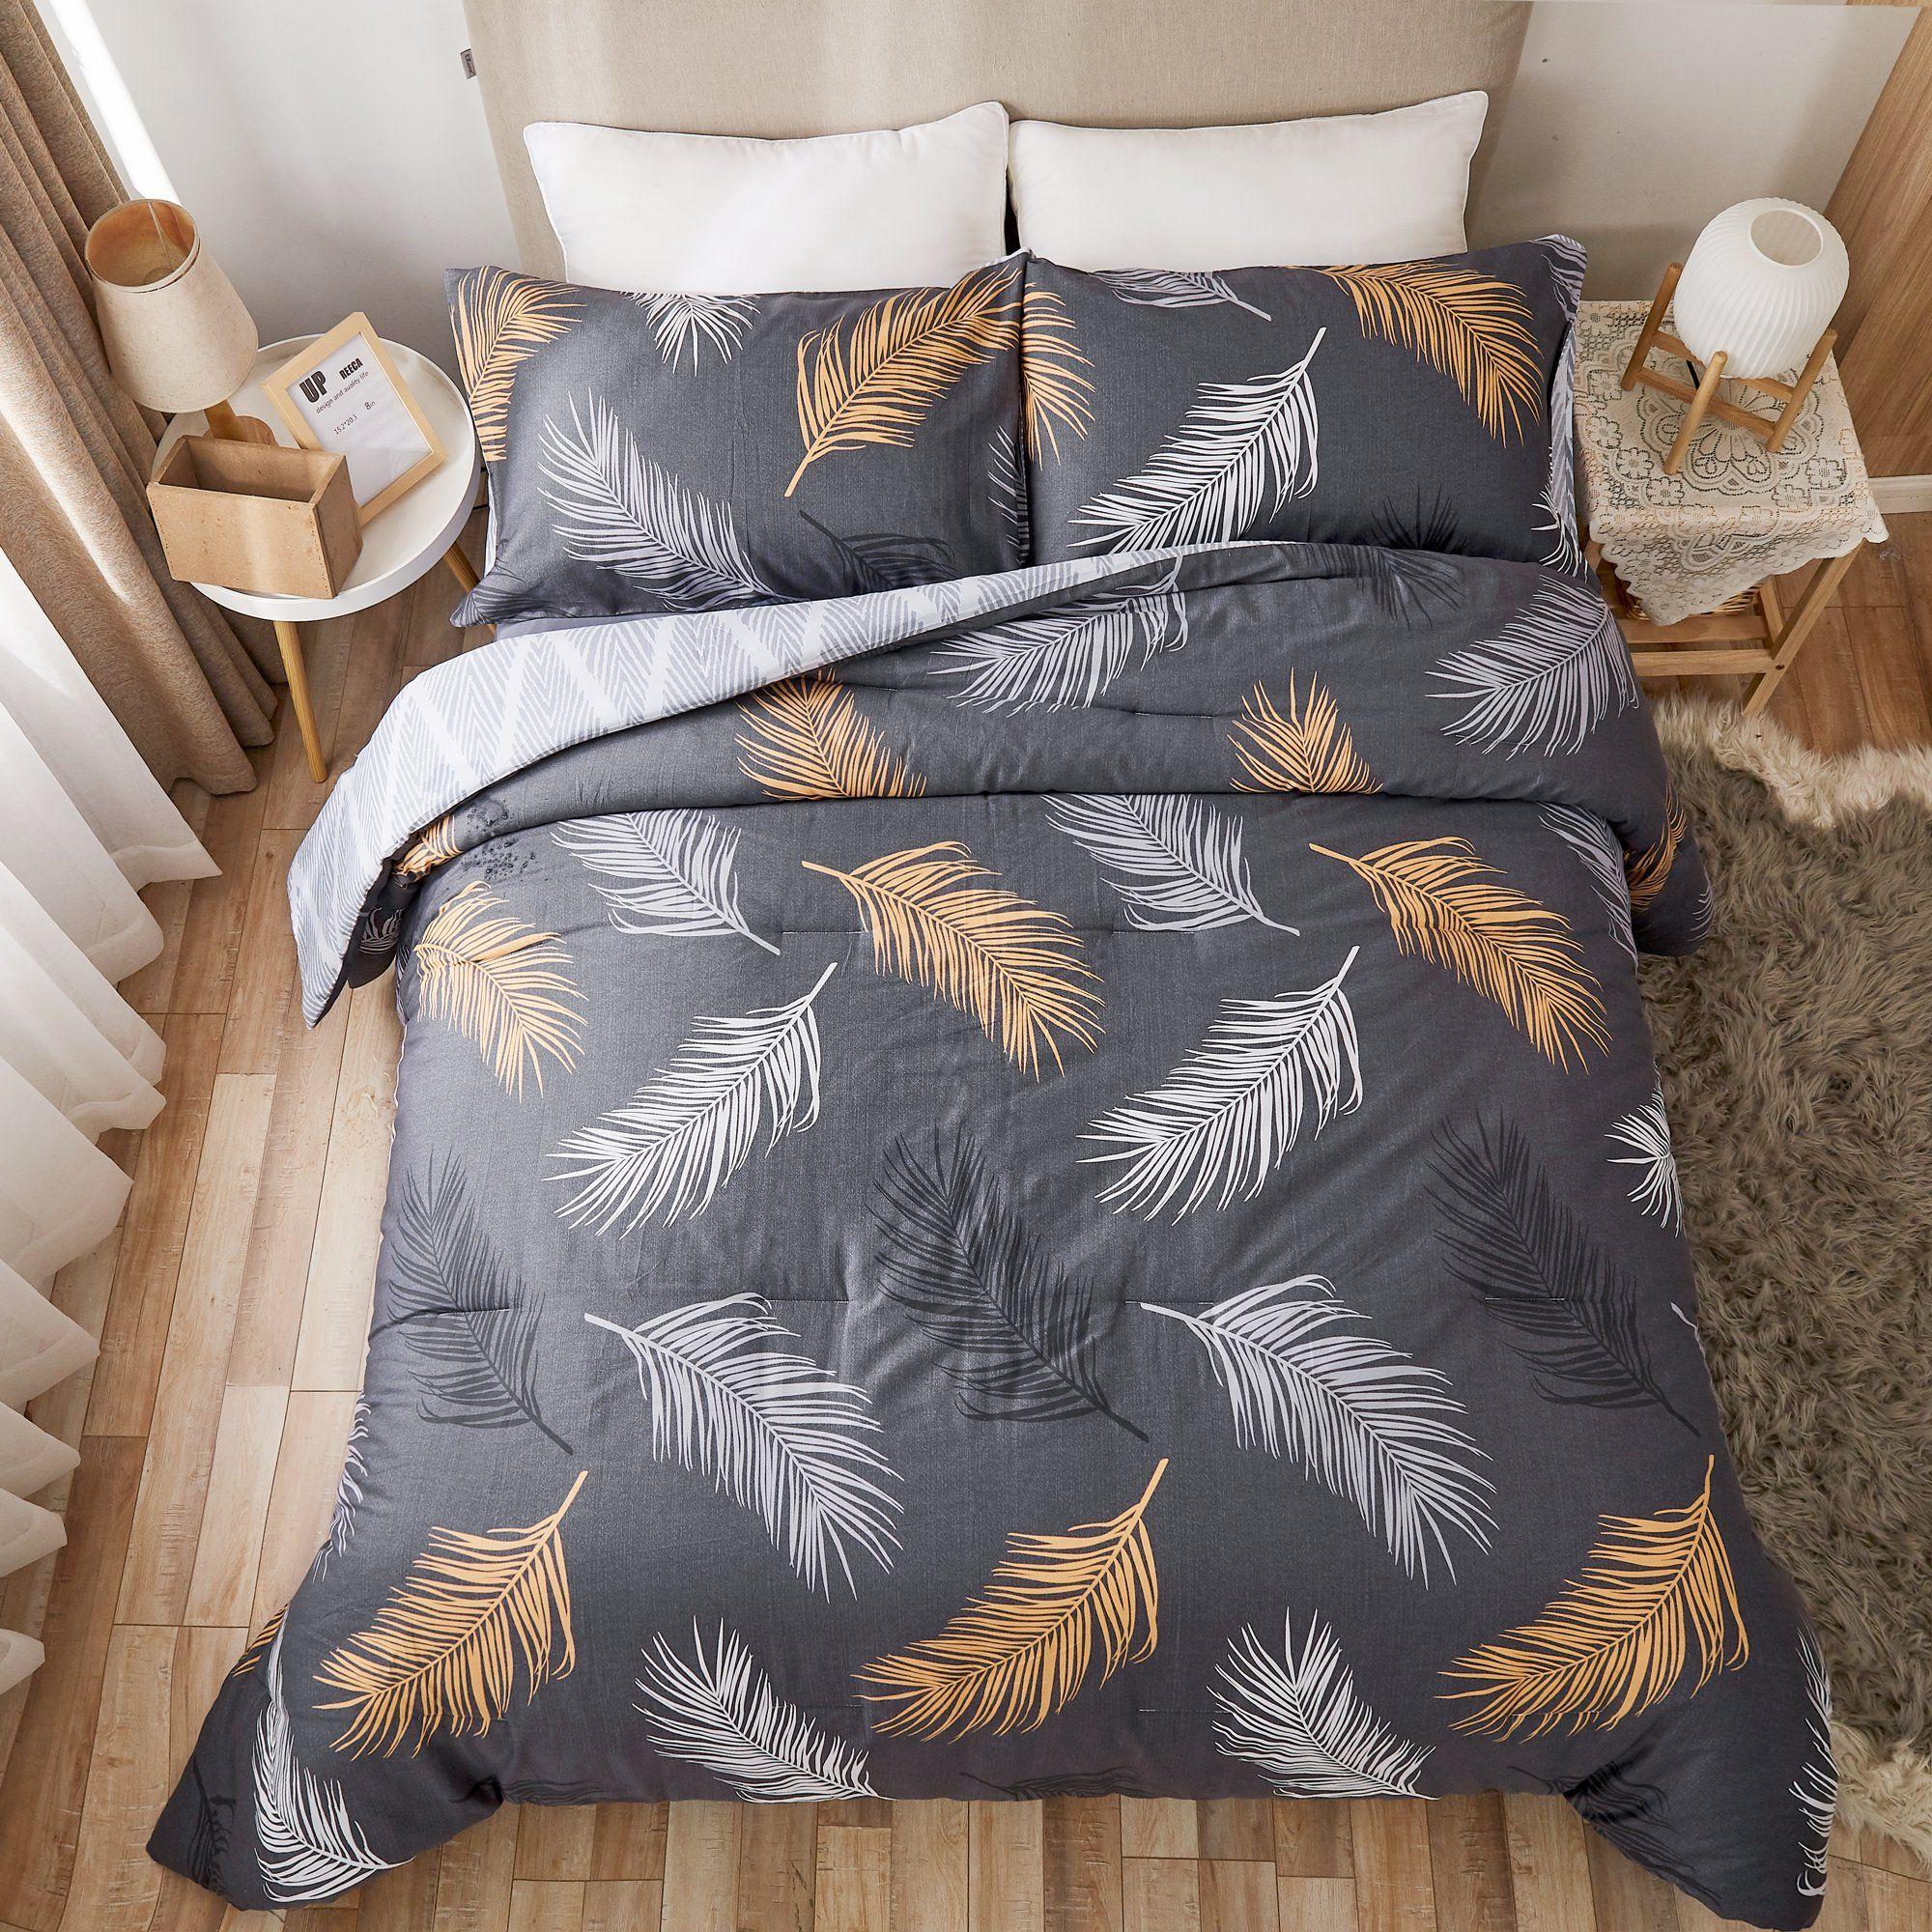 Peach Leaf 3 Piece Cotton Bedding Comforter Set Feather Pattern King Walmart Com In 2021 Comforter Sets King Size Comforters Duvet Bedding Sets